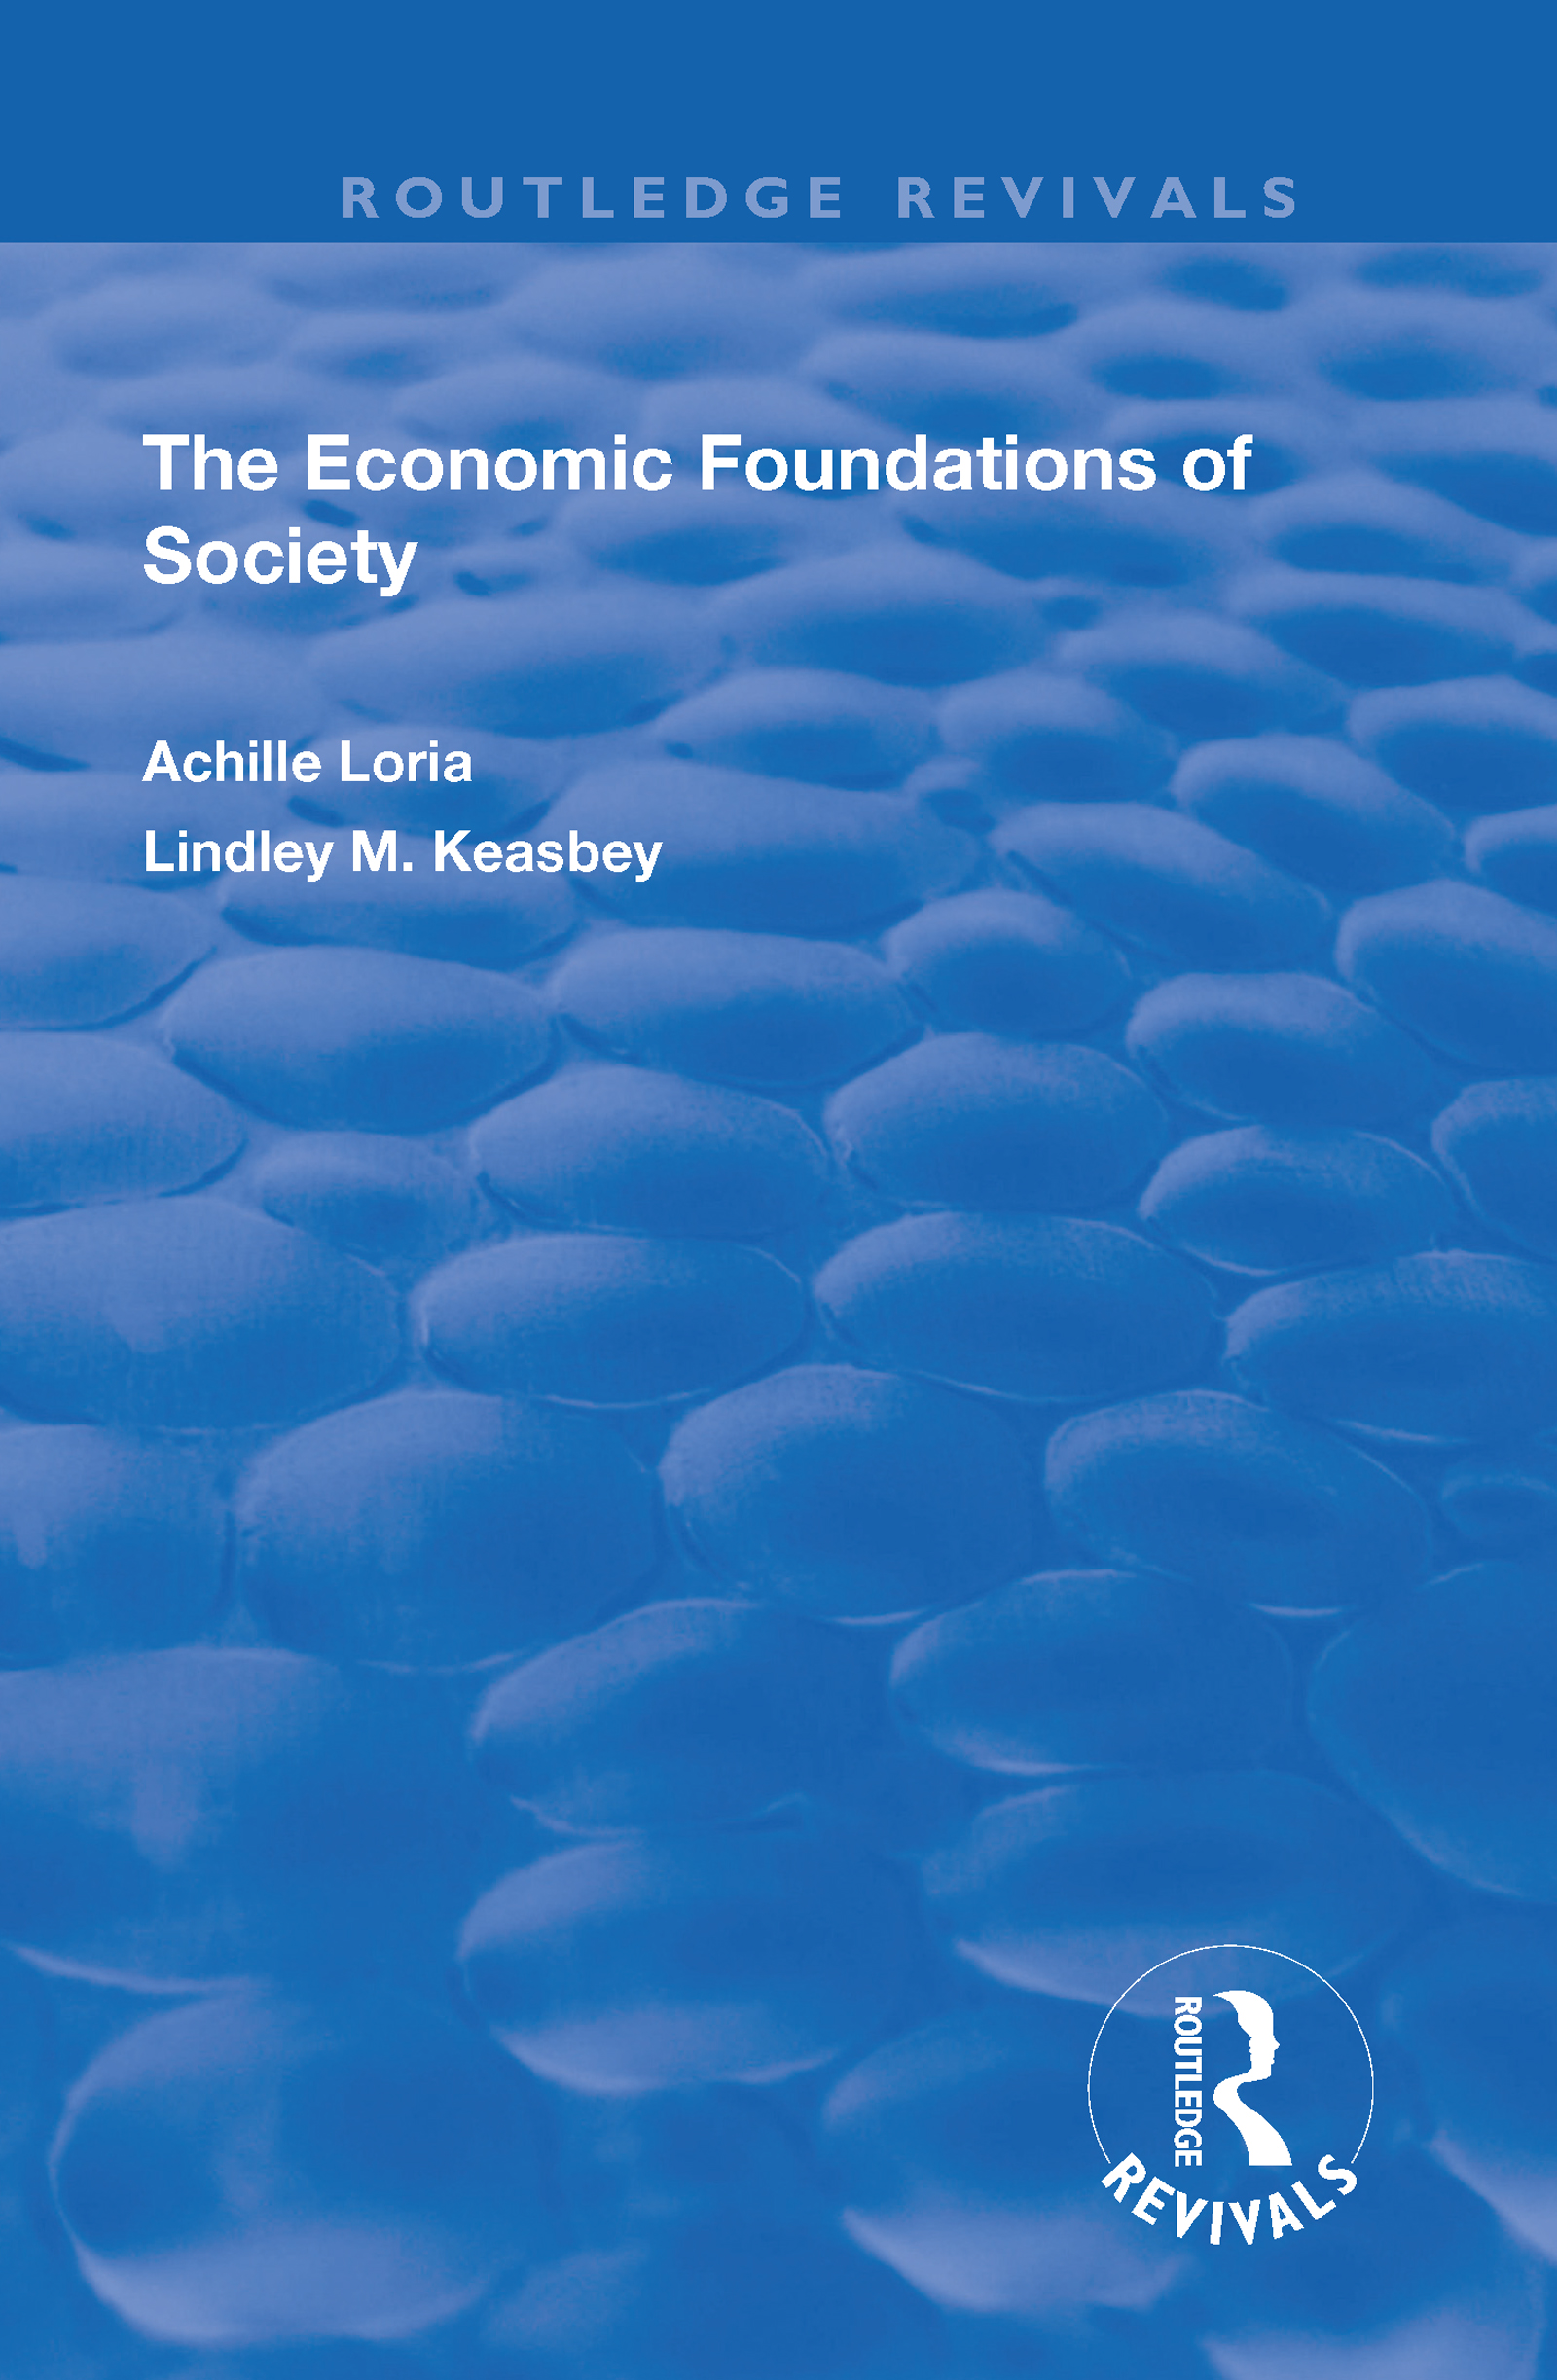 Economic Foundations of Society